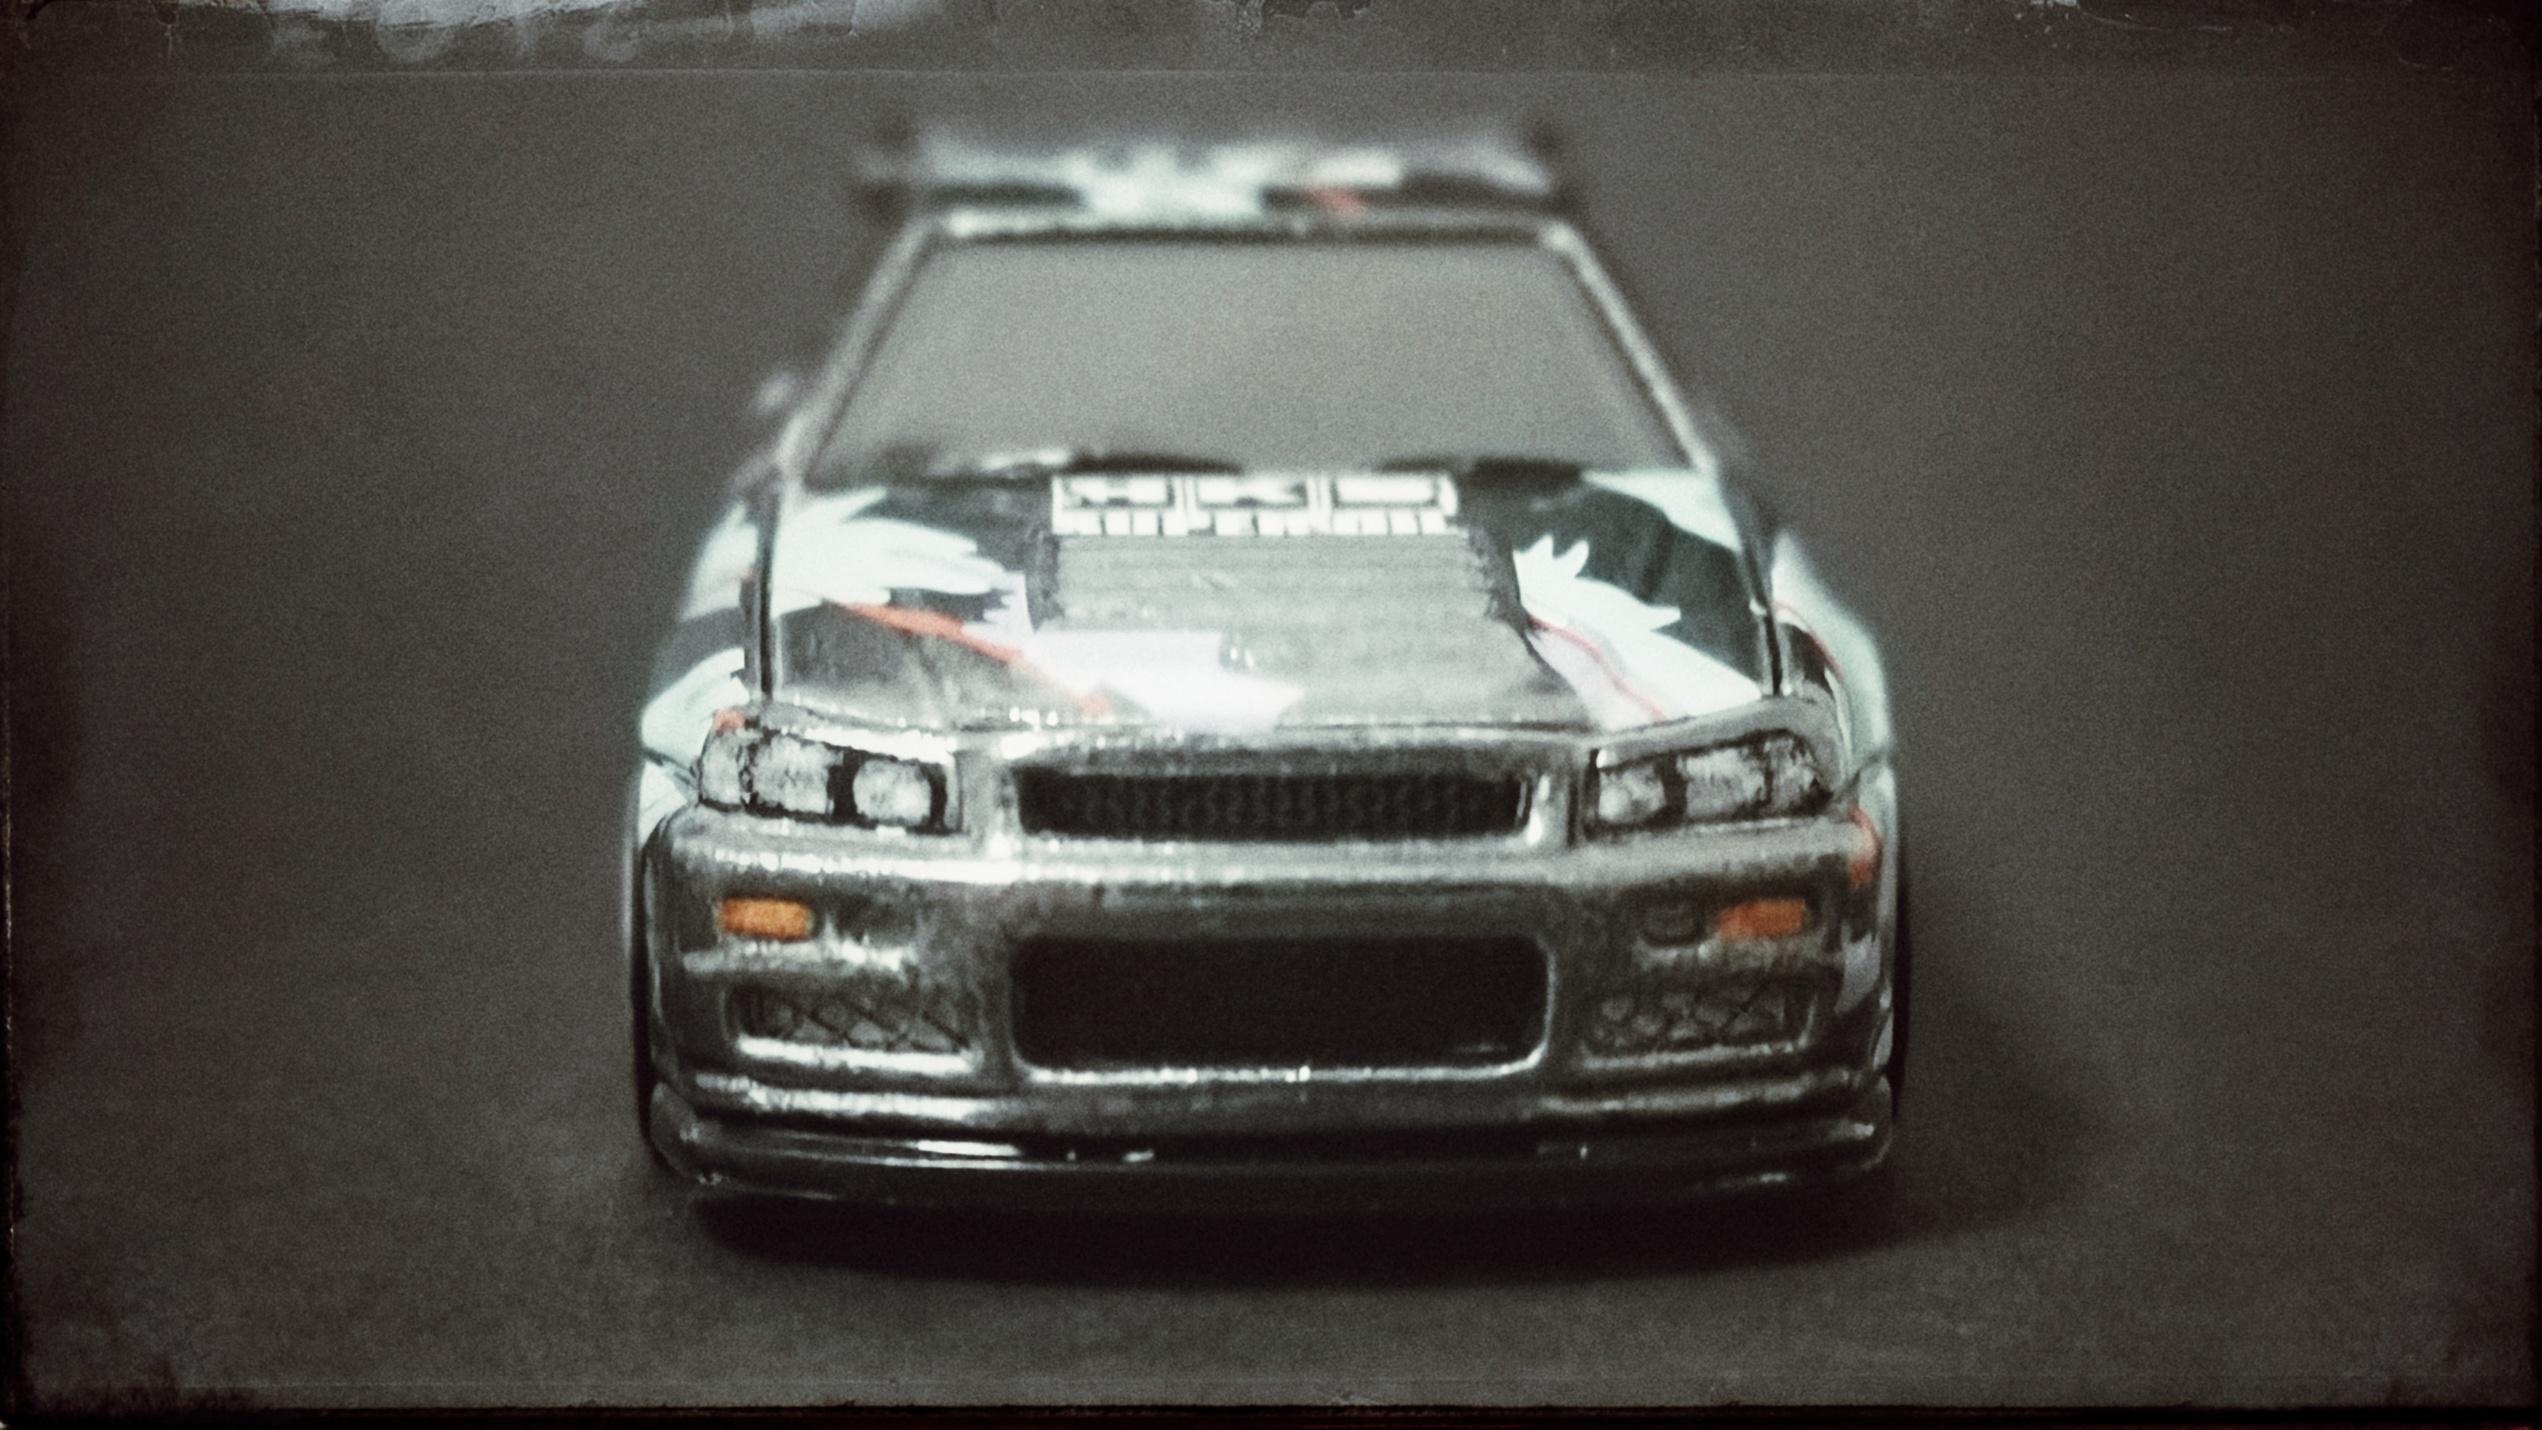 Hot Wheels id Nissan Skyline GT-R (R34) (HBG07) 2021 HW Speed Graphics (03/04) spectraflame black front